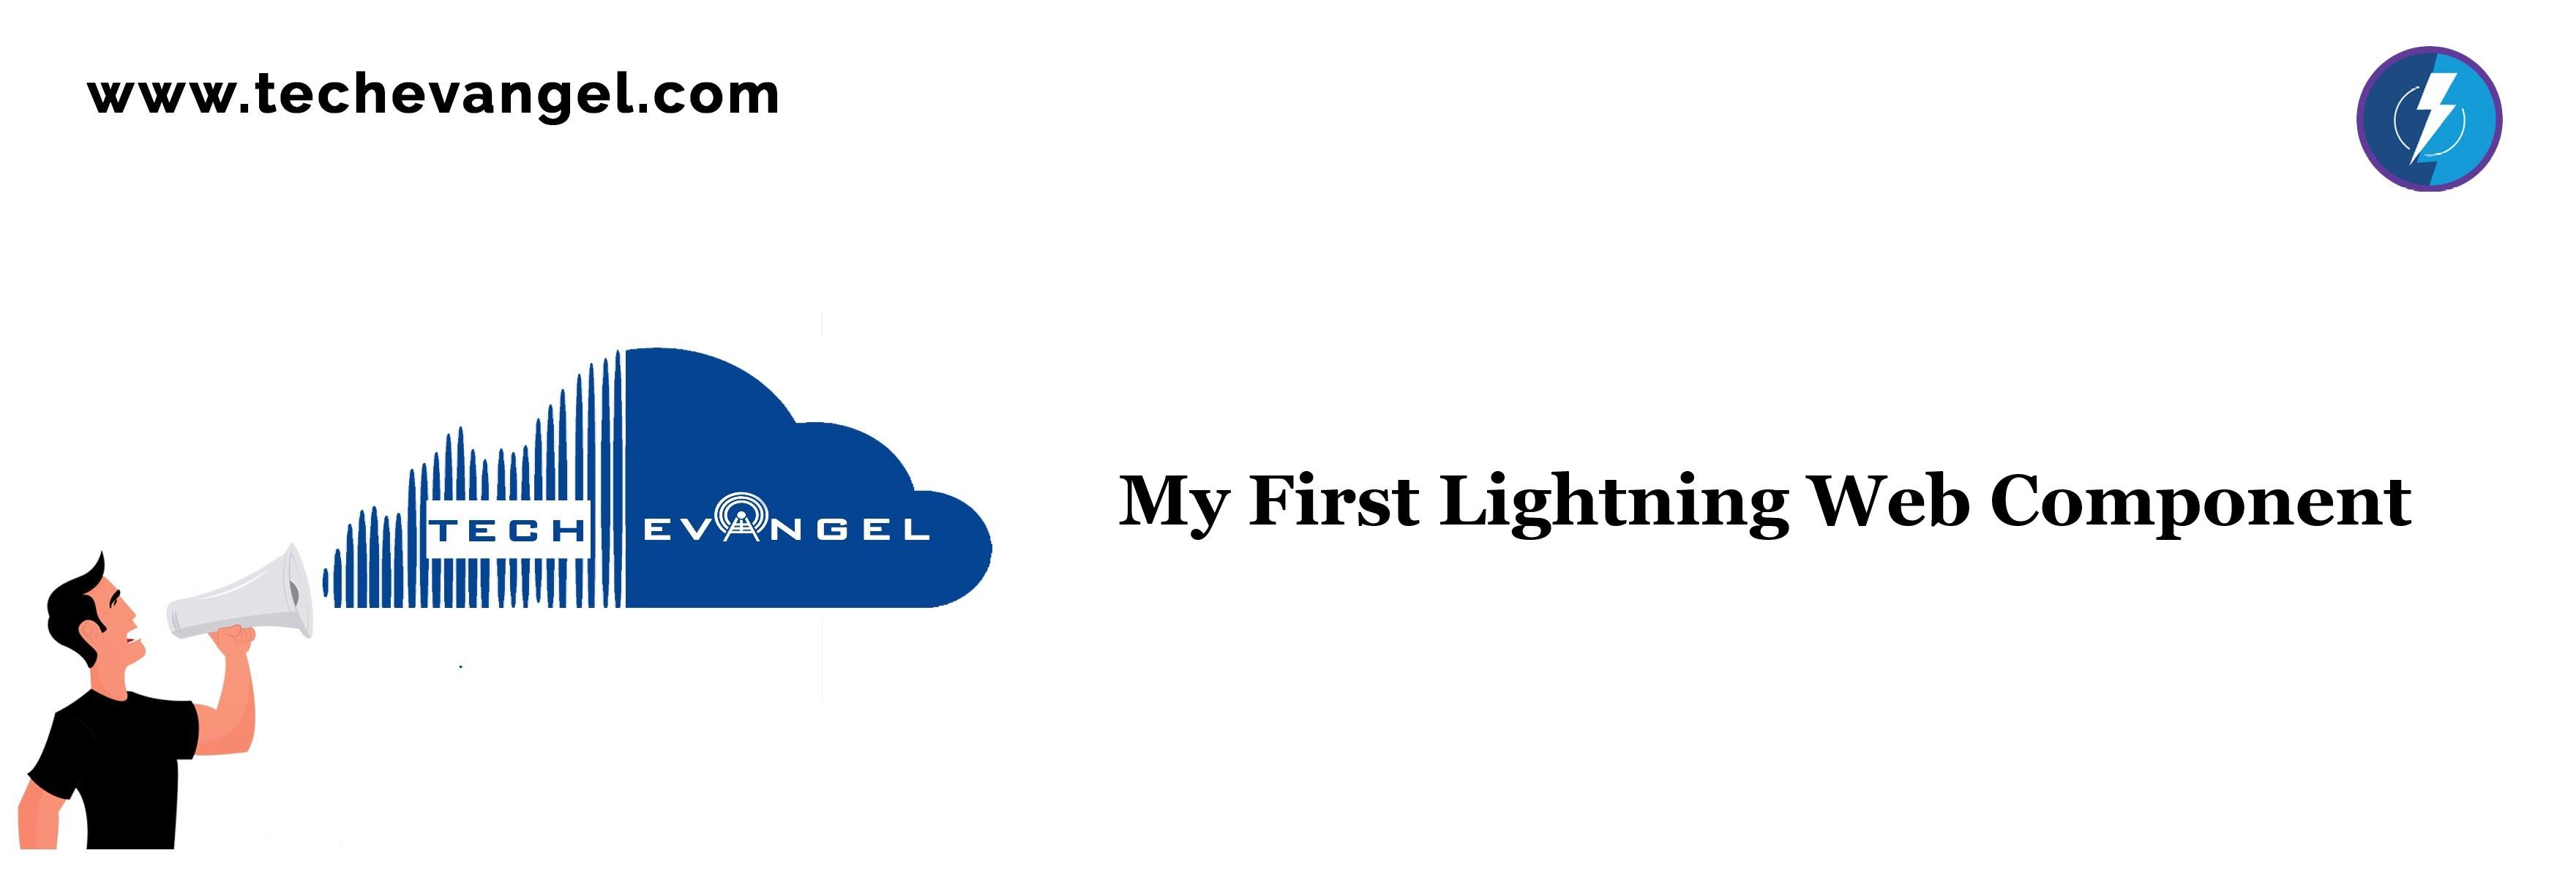 My First Lightning Web Component – Tech Evangel